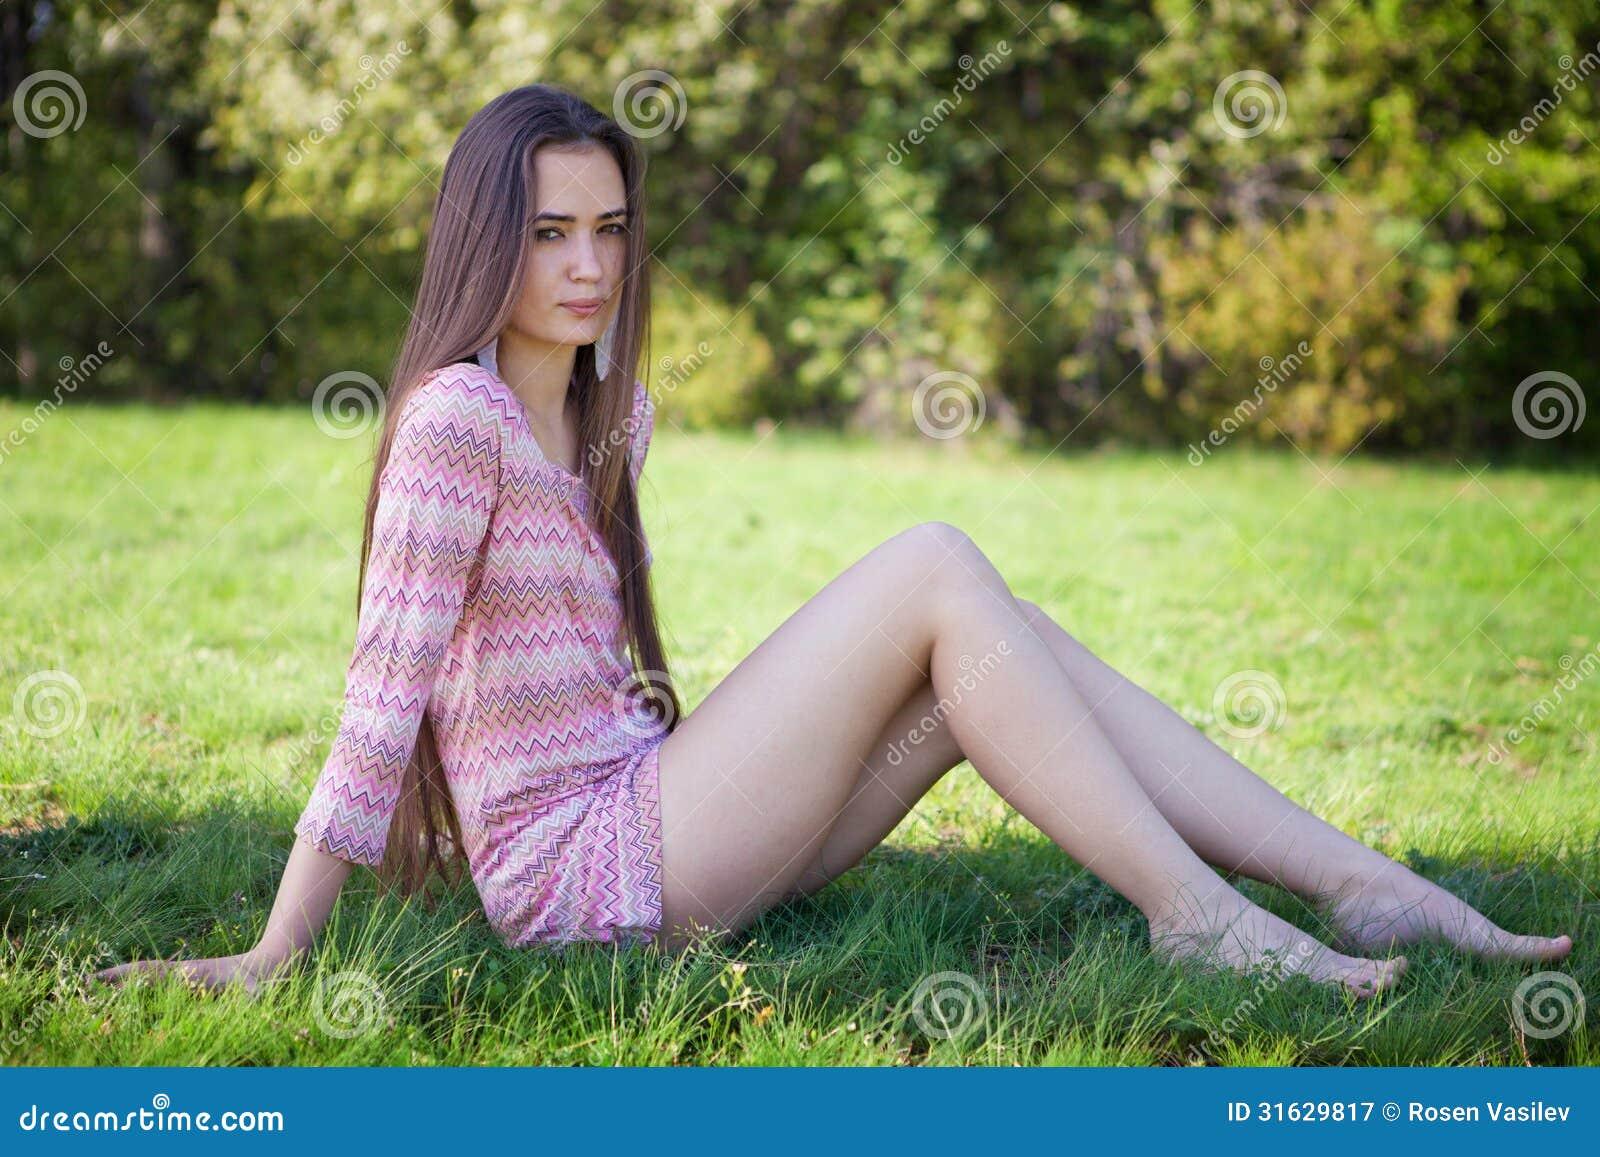 Girl In Grass Skirt Topless | Hot Girl HD Wallpaper